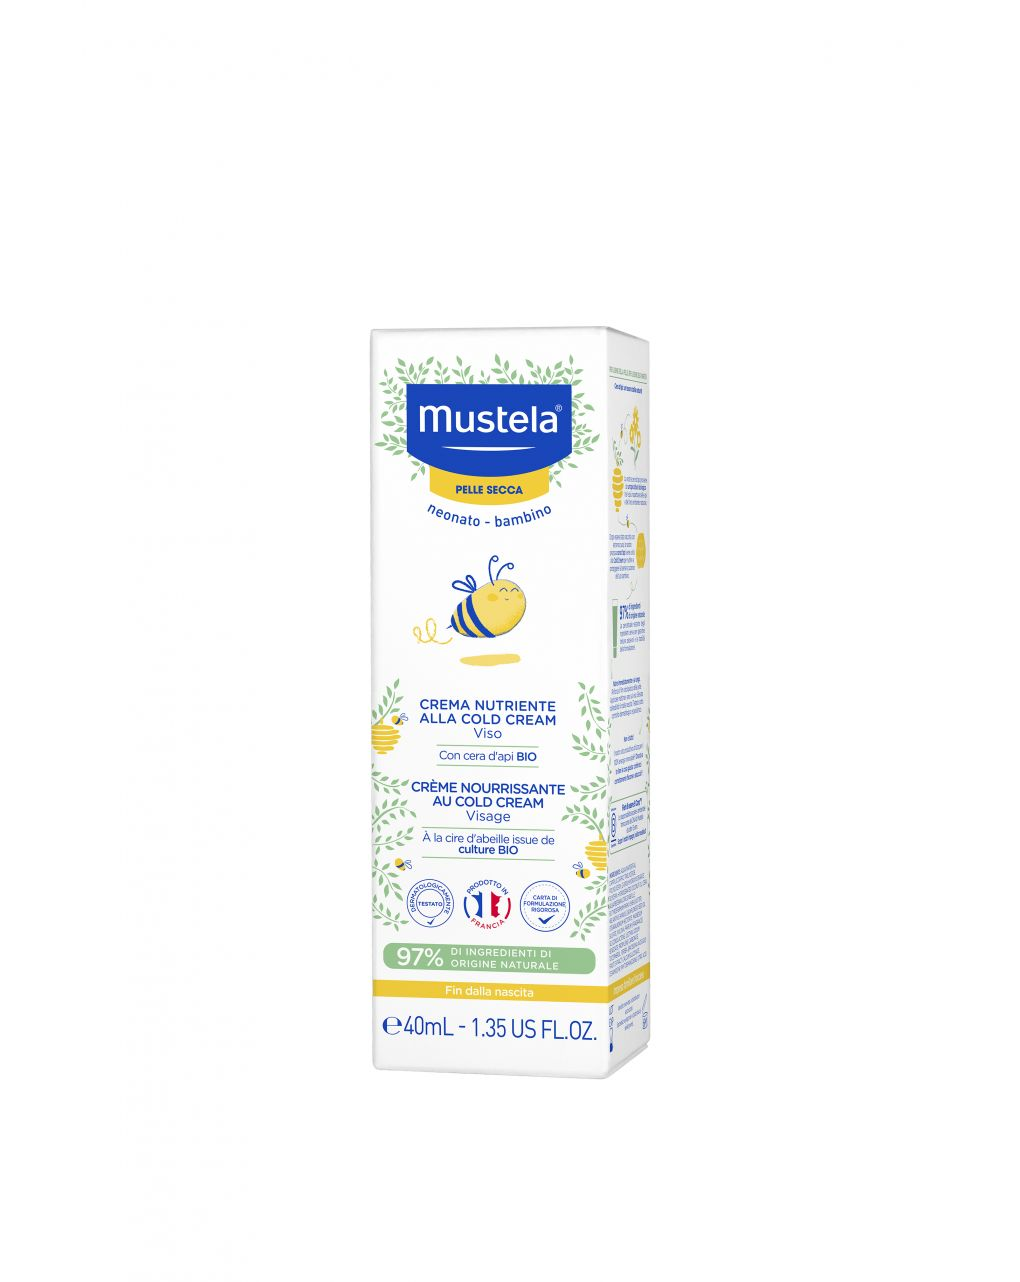 Crema nutriente alla cold cream 40ml - Mustela